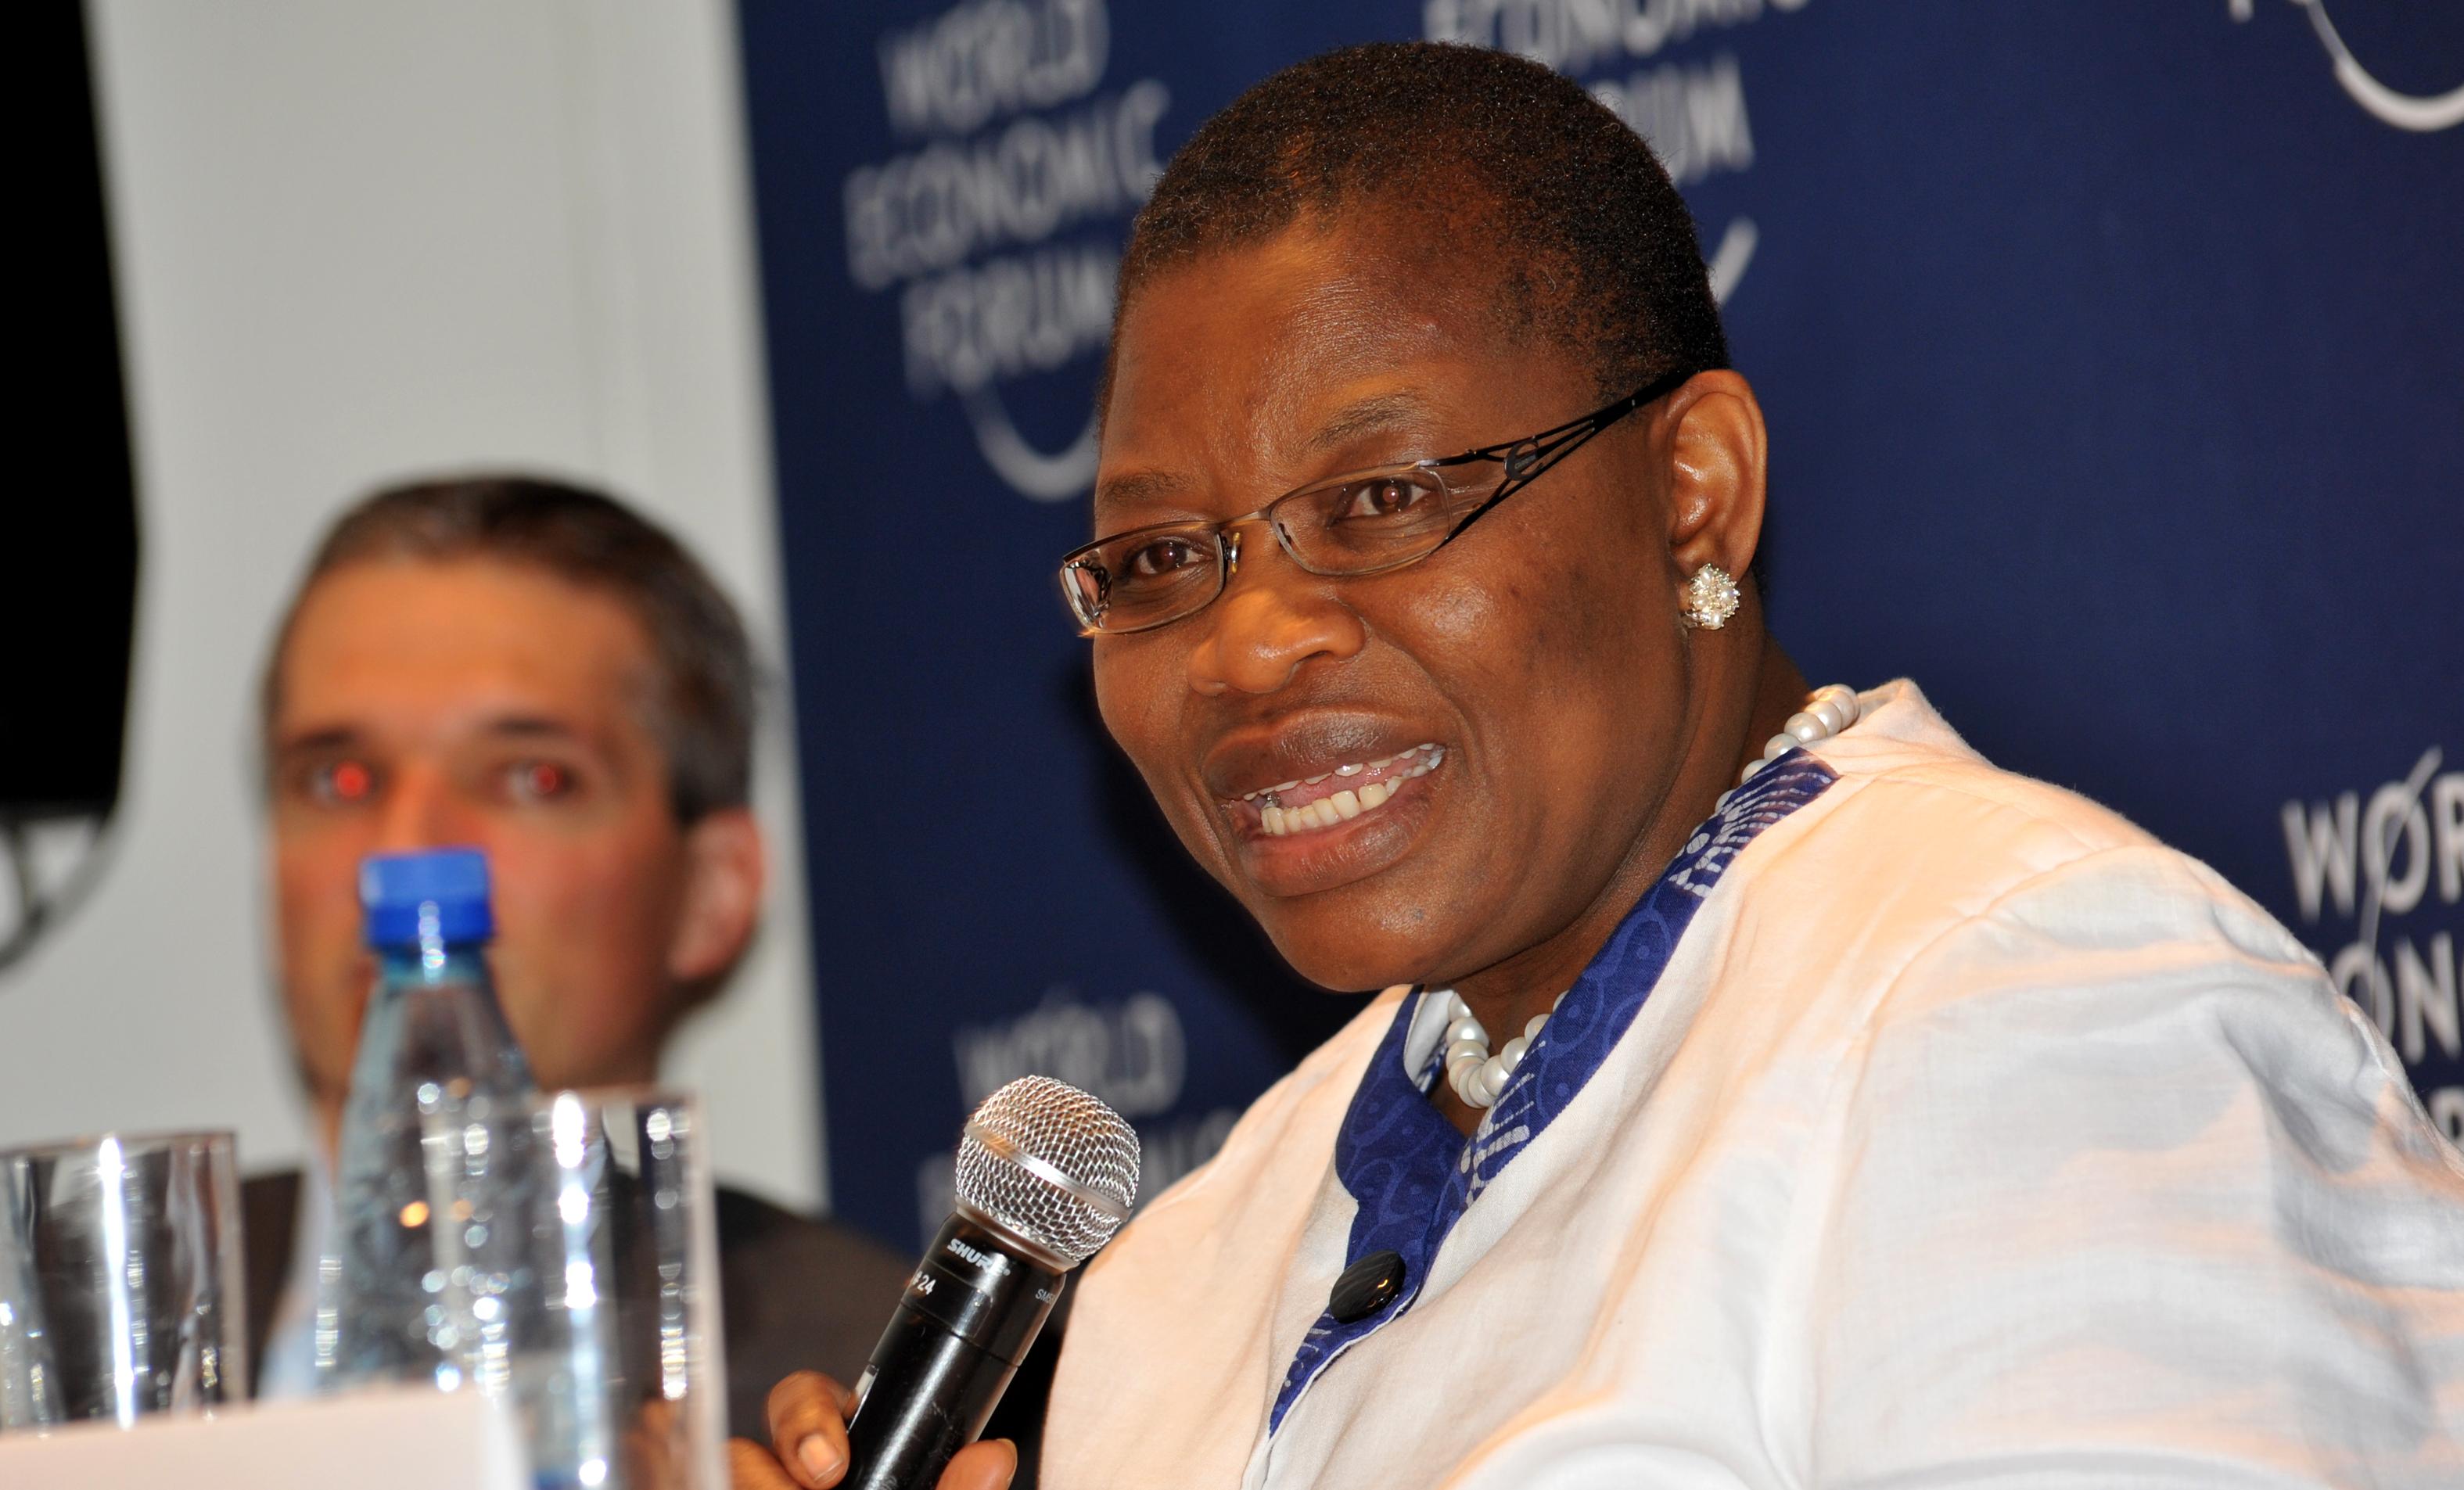 File:Obiageli Katryn Ezekwesili, 2009 World Economic Forum on Africa.jpg -  Wikimedia Commons